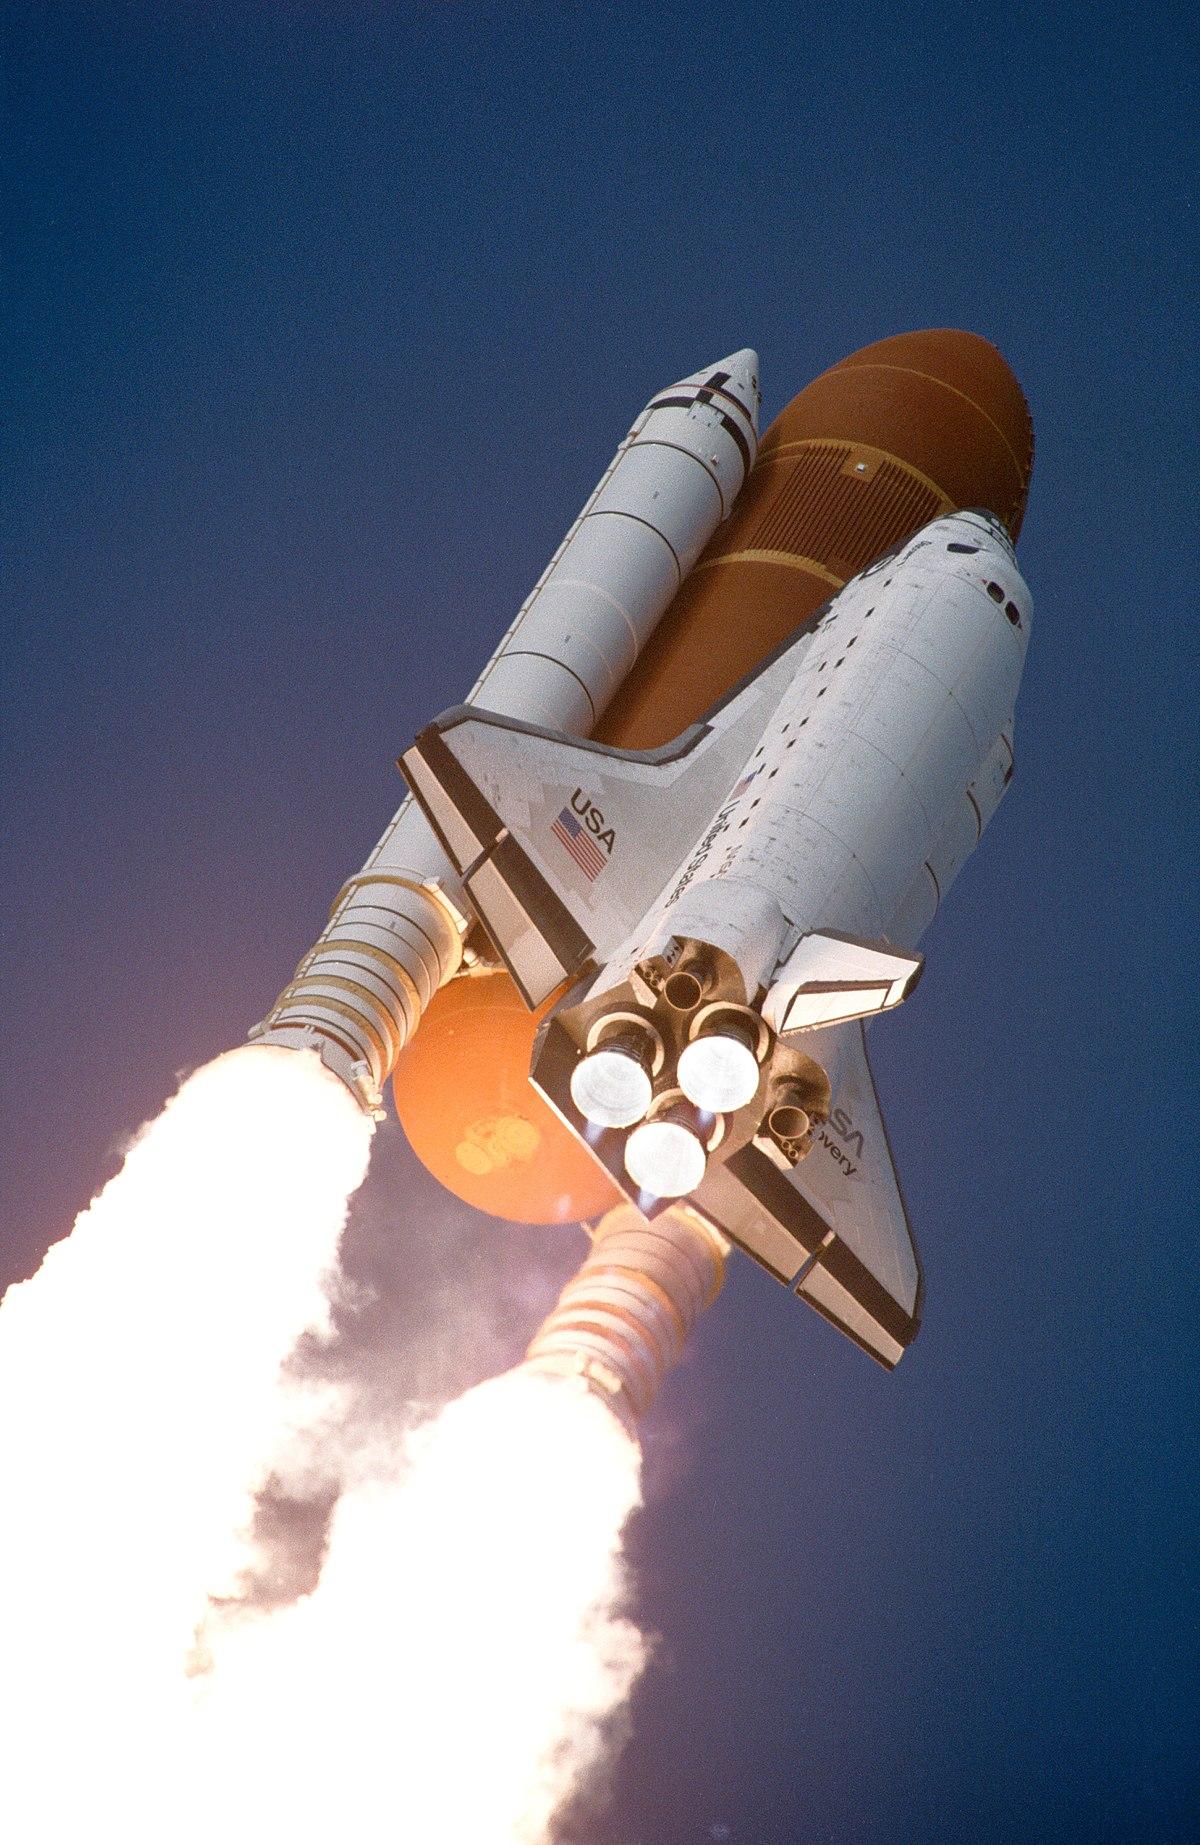 space shuttle erster start - photo #11